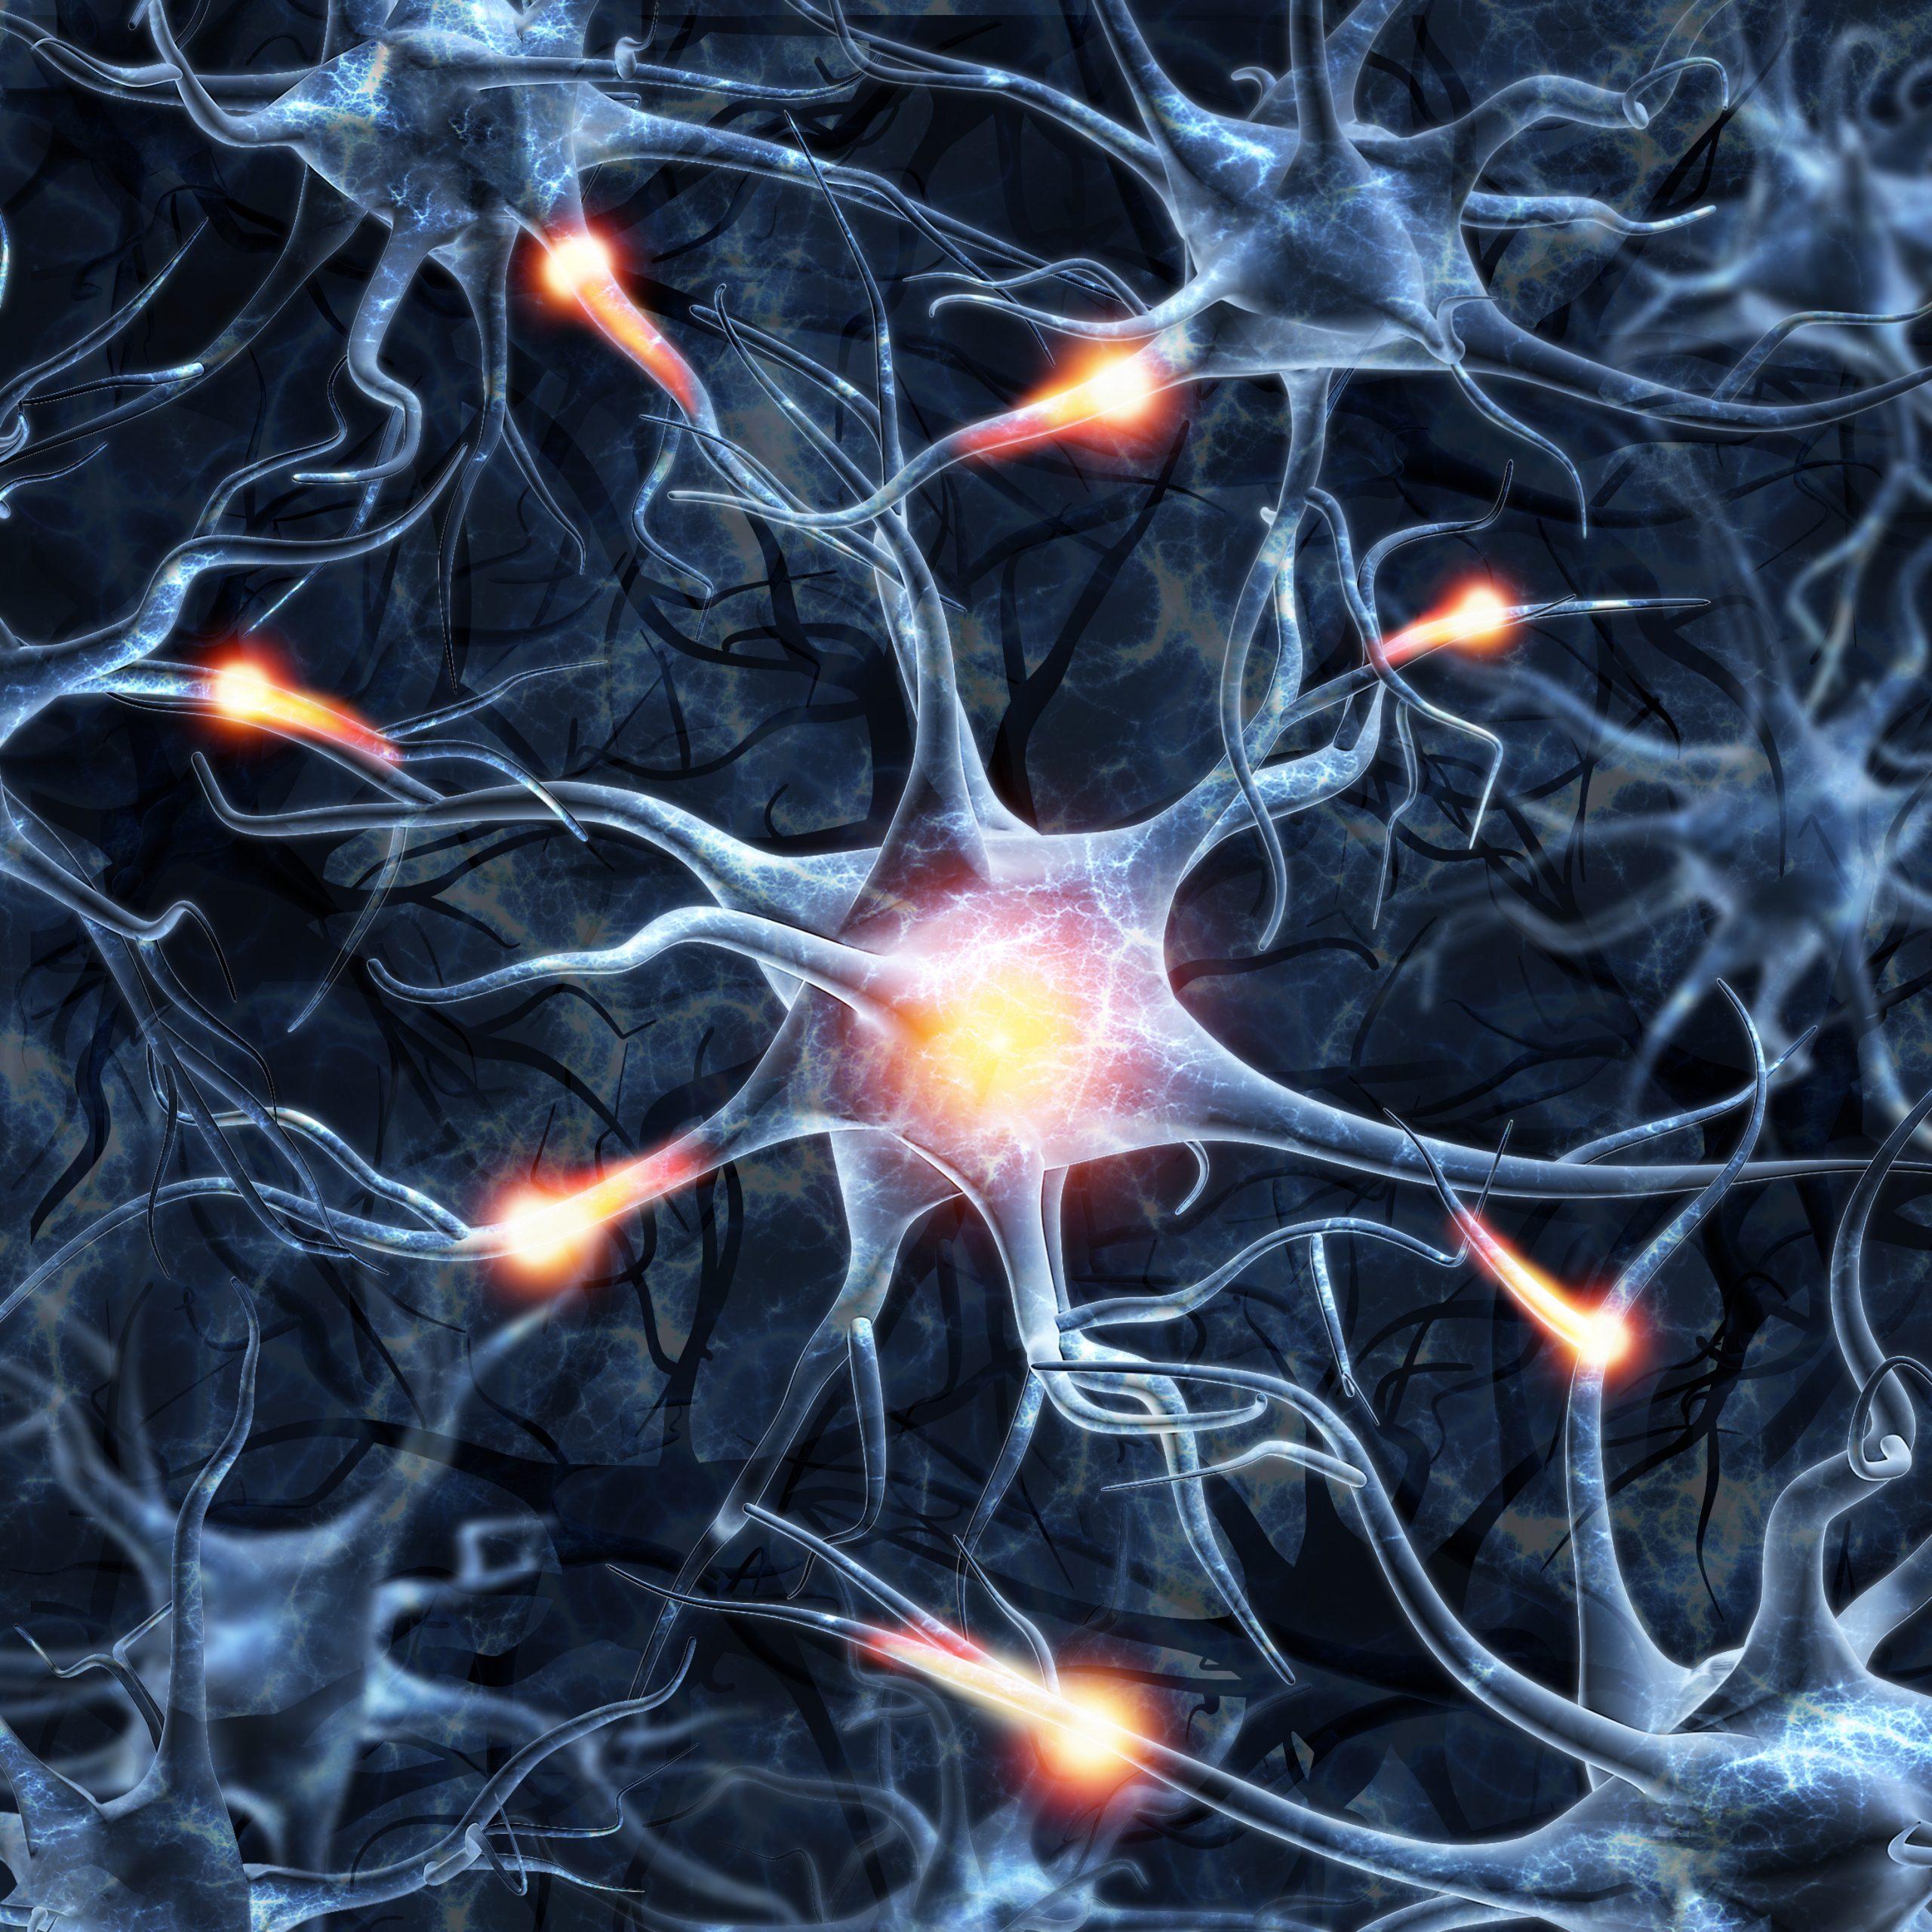 brain interfacing - https://depositphotos.com/75383115/stock-photo-illustration-of-neurons-on-a.html